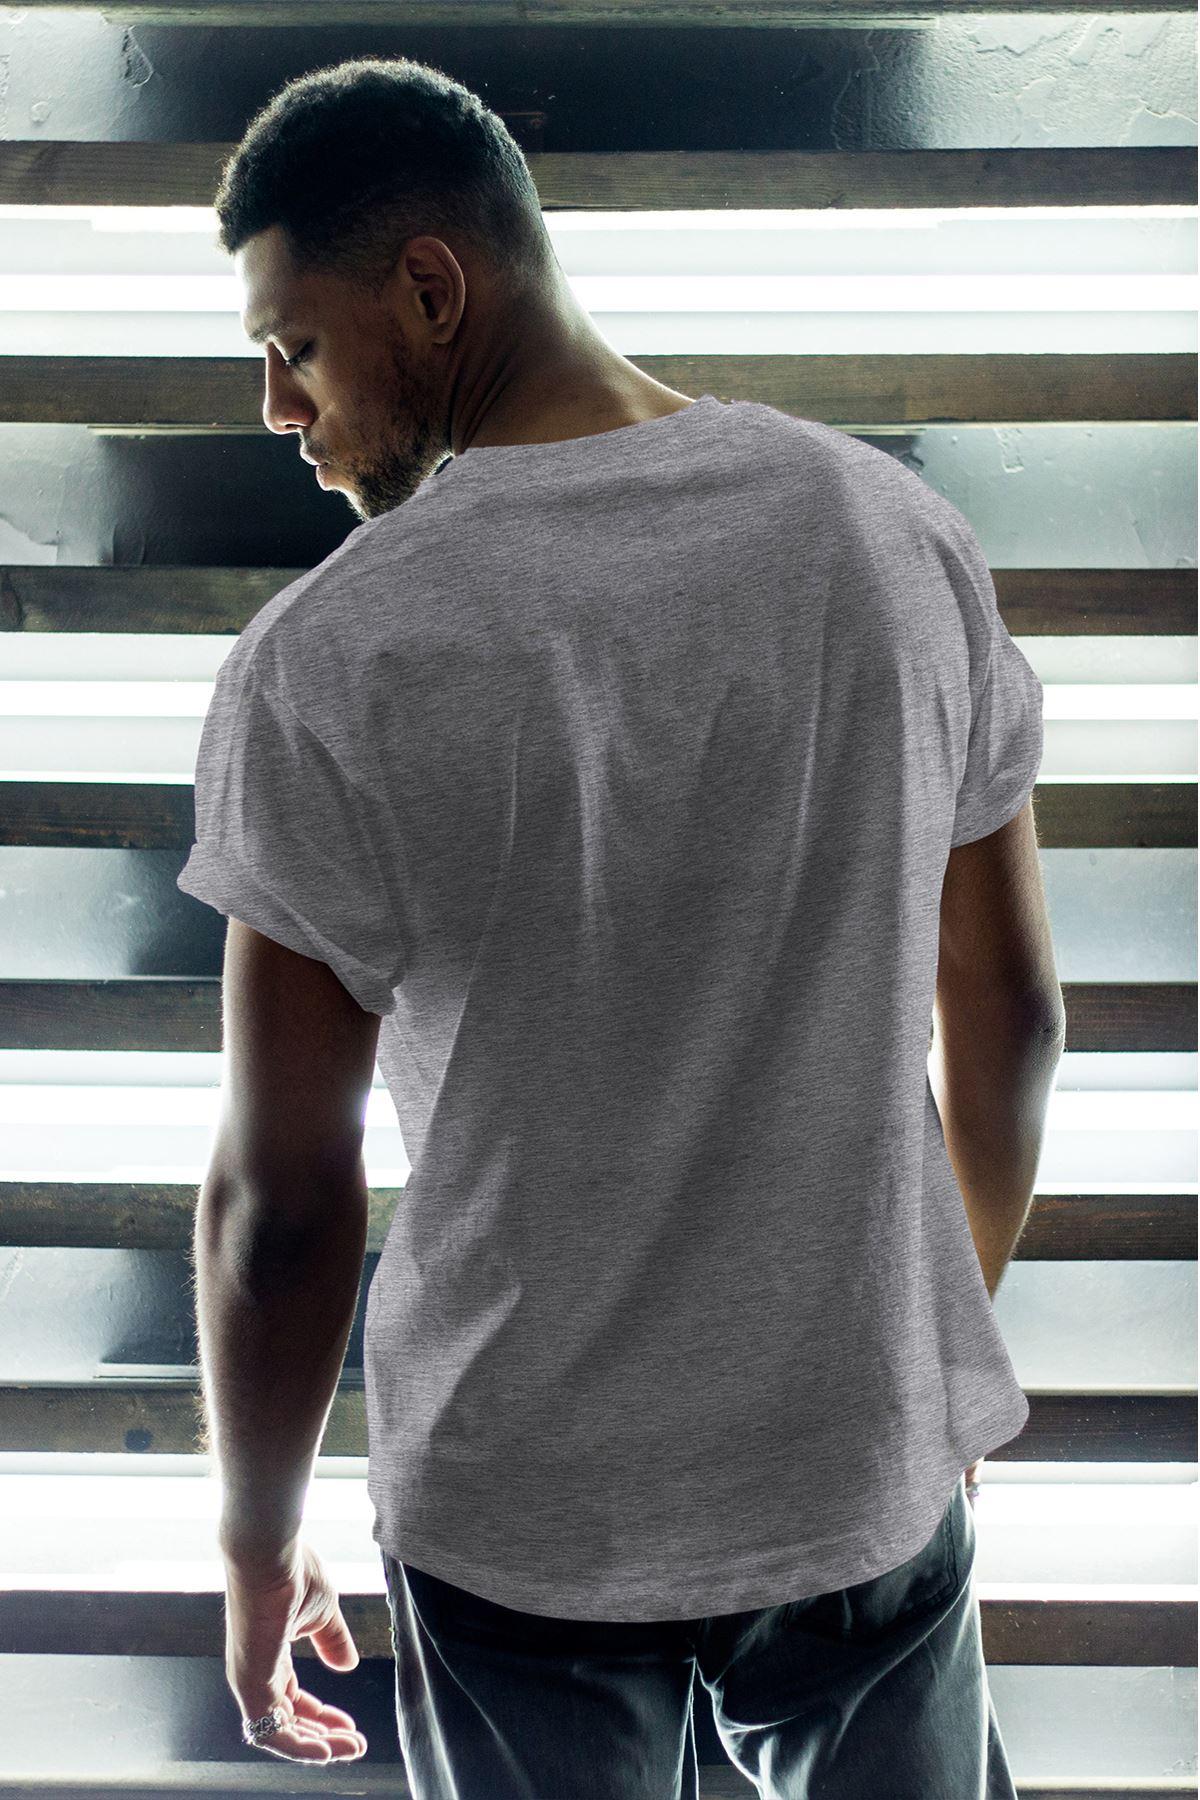 Camping Gri Erkek Oversize Tshirt - Tişört